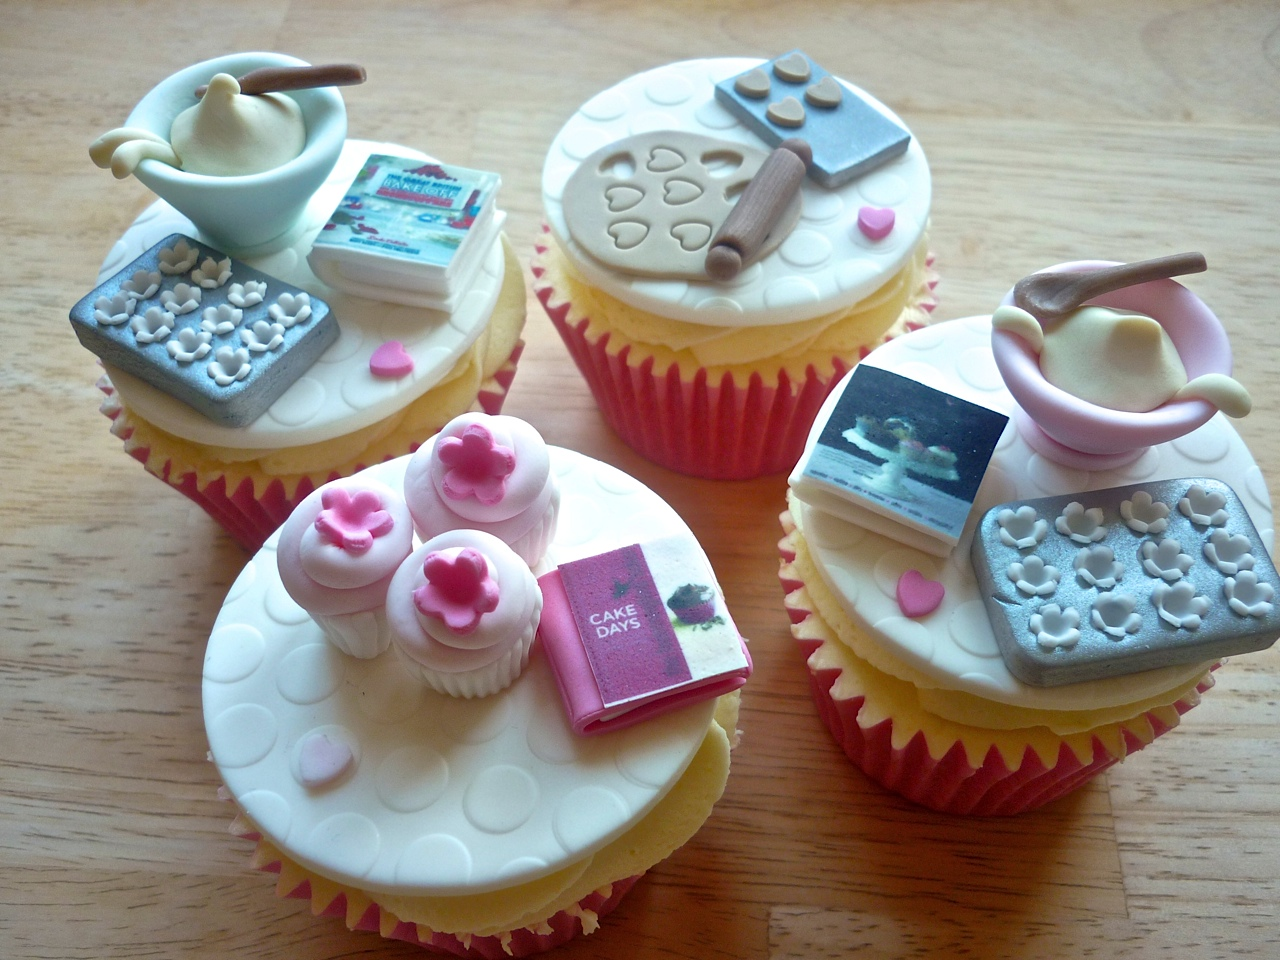 Jolly Scrumptious Cupcakes